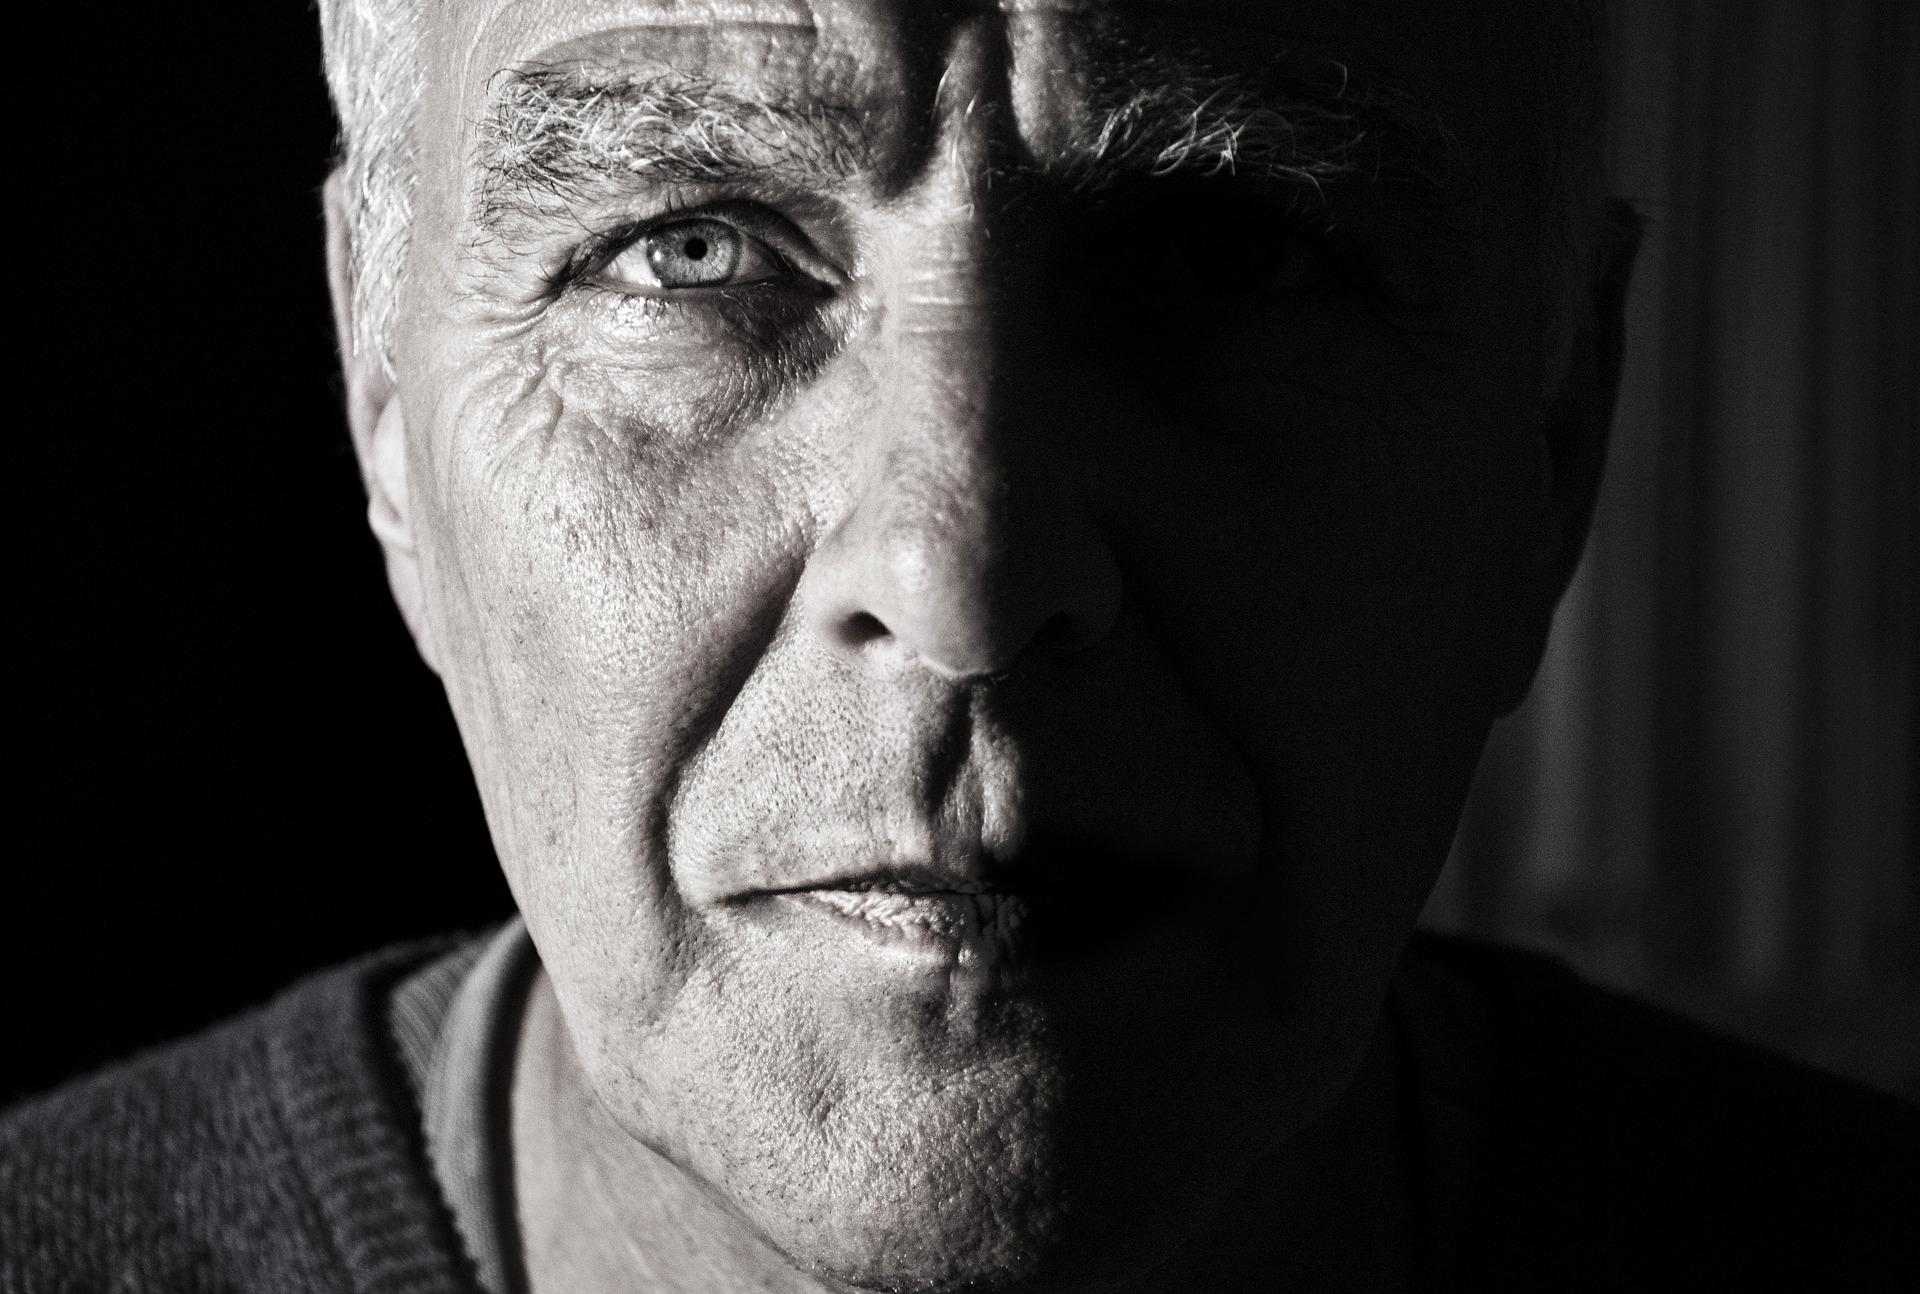 NATURE:阿尔兹海默症中tau蛋白主要通过LRP1传播